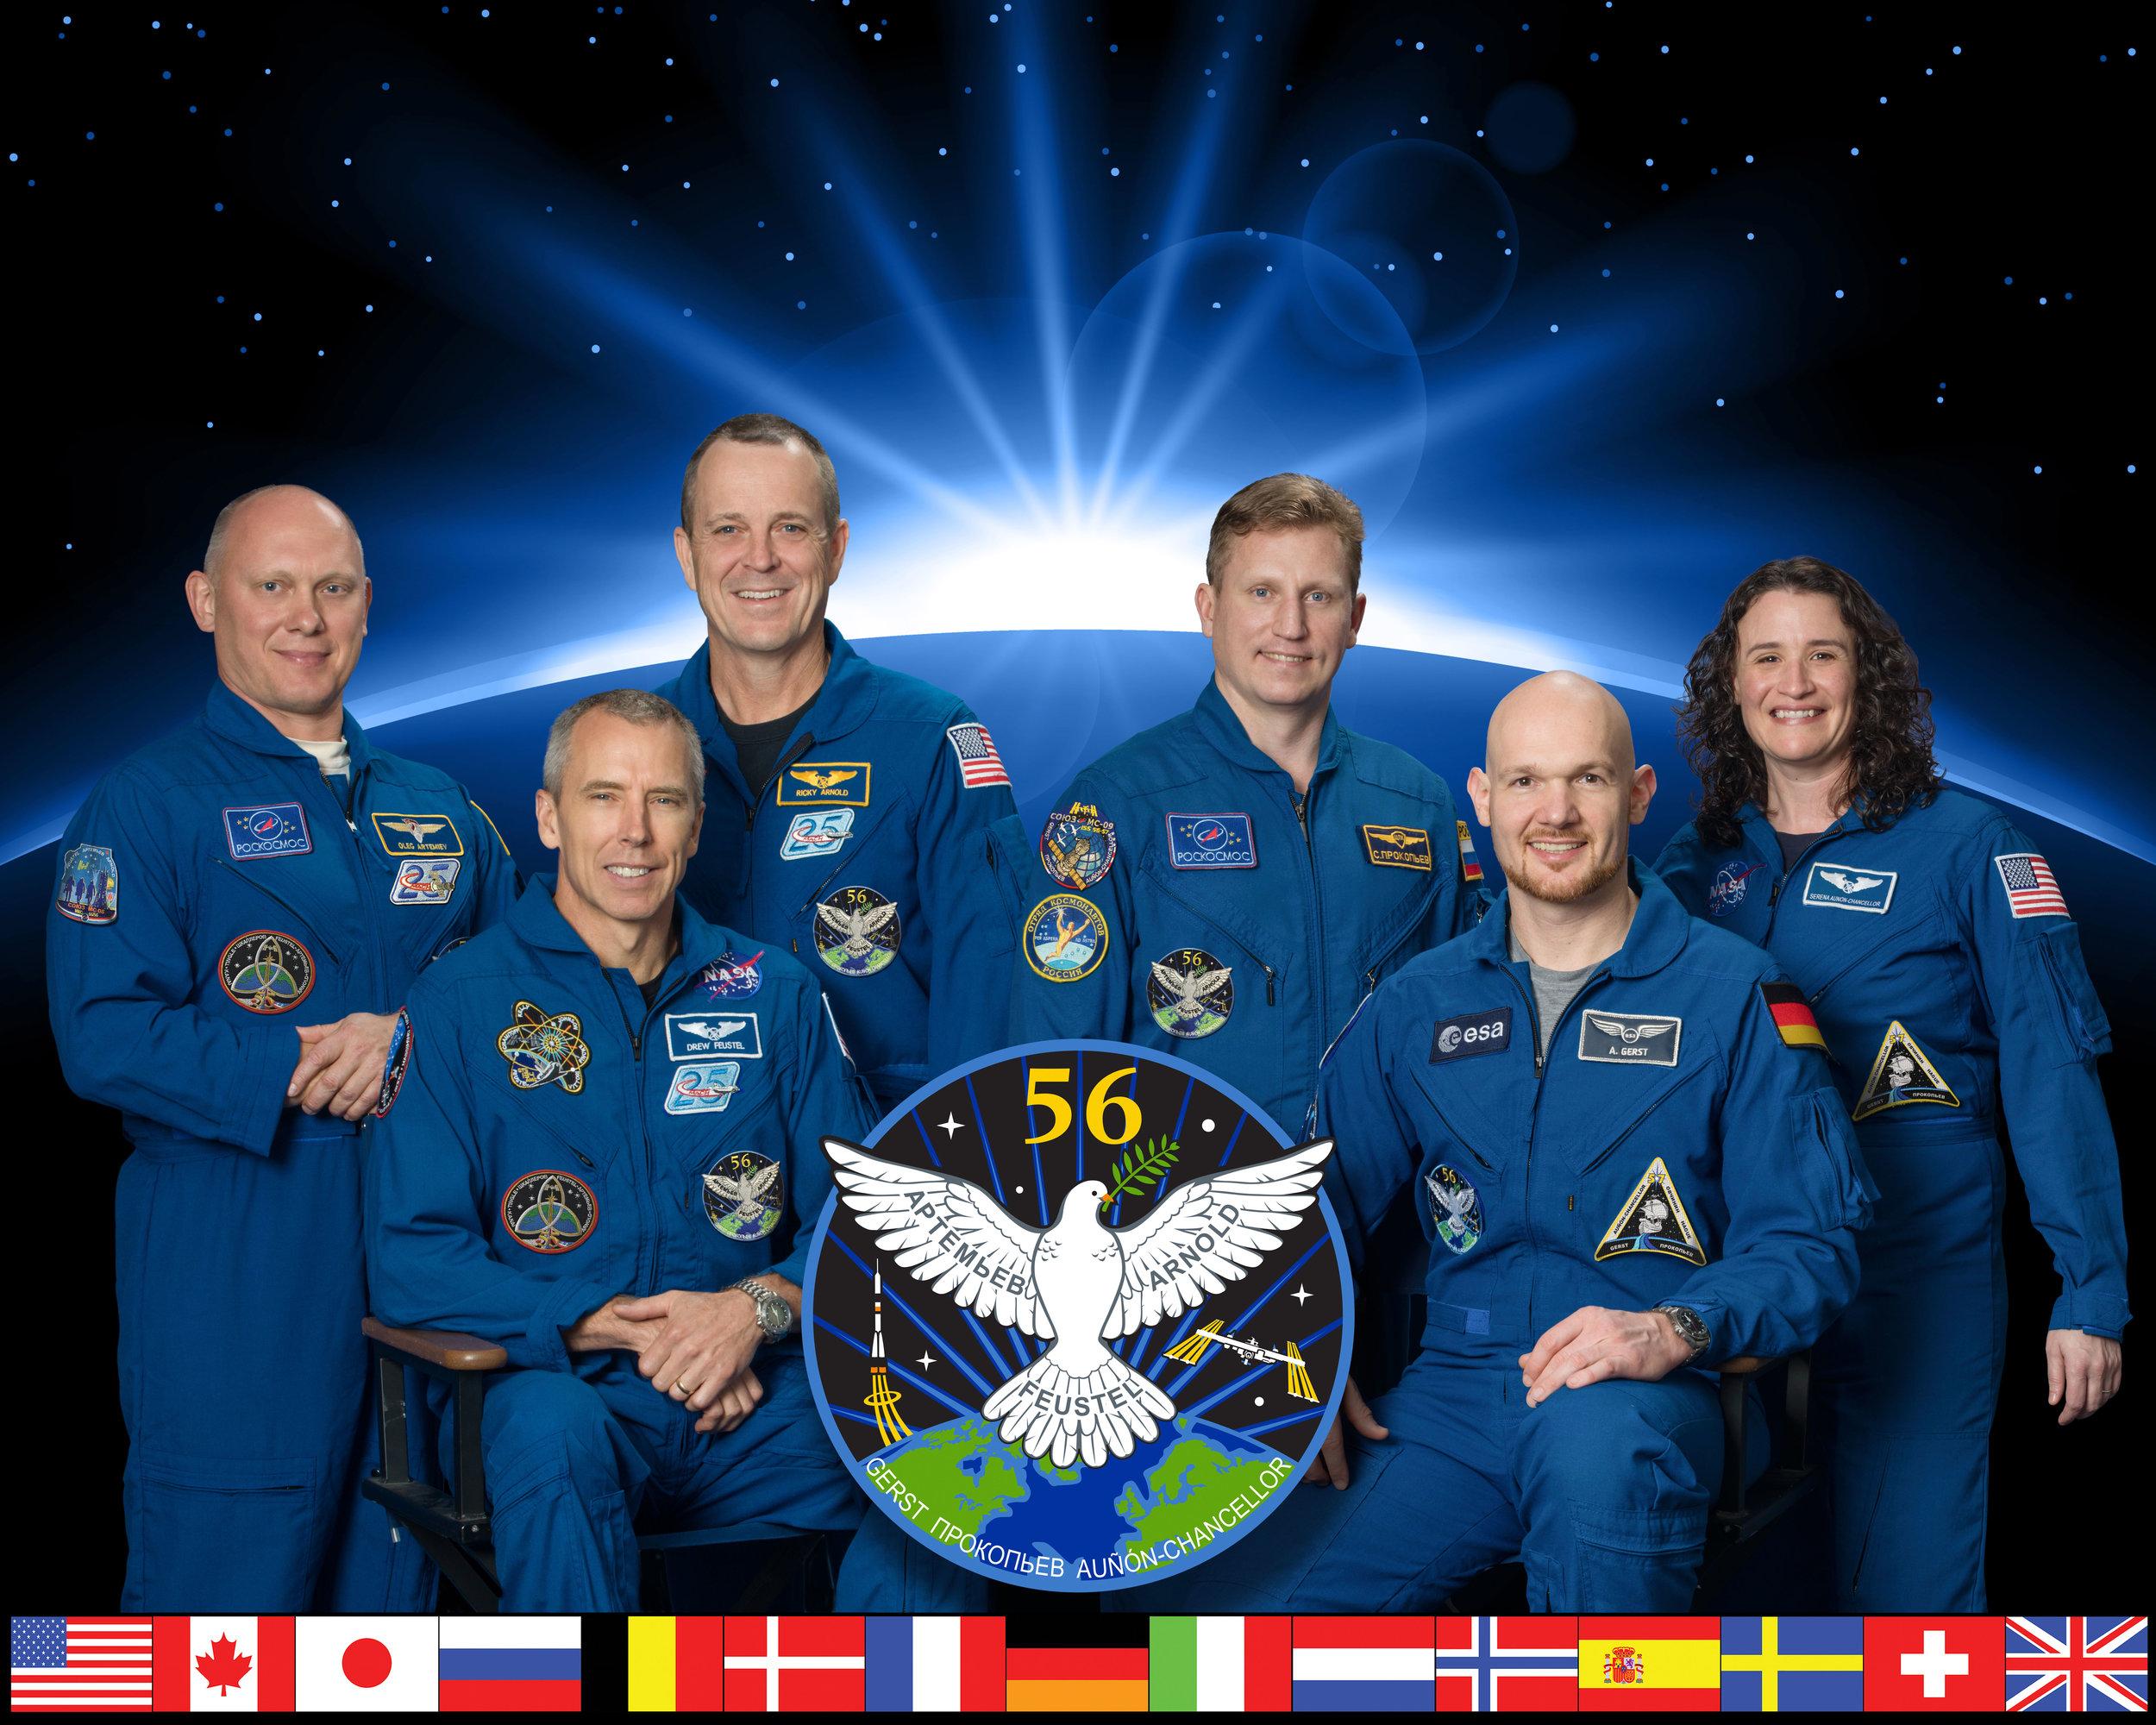 Expedition_56_crew_portrait.jpg